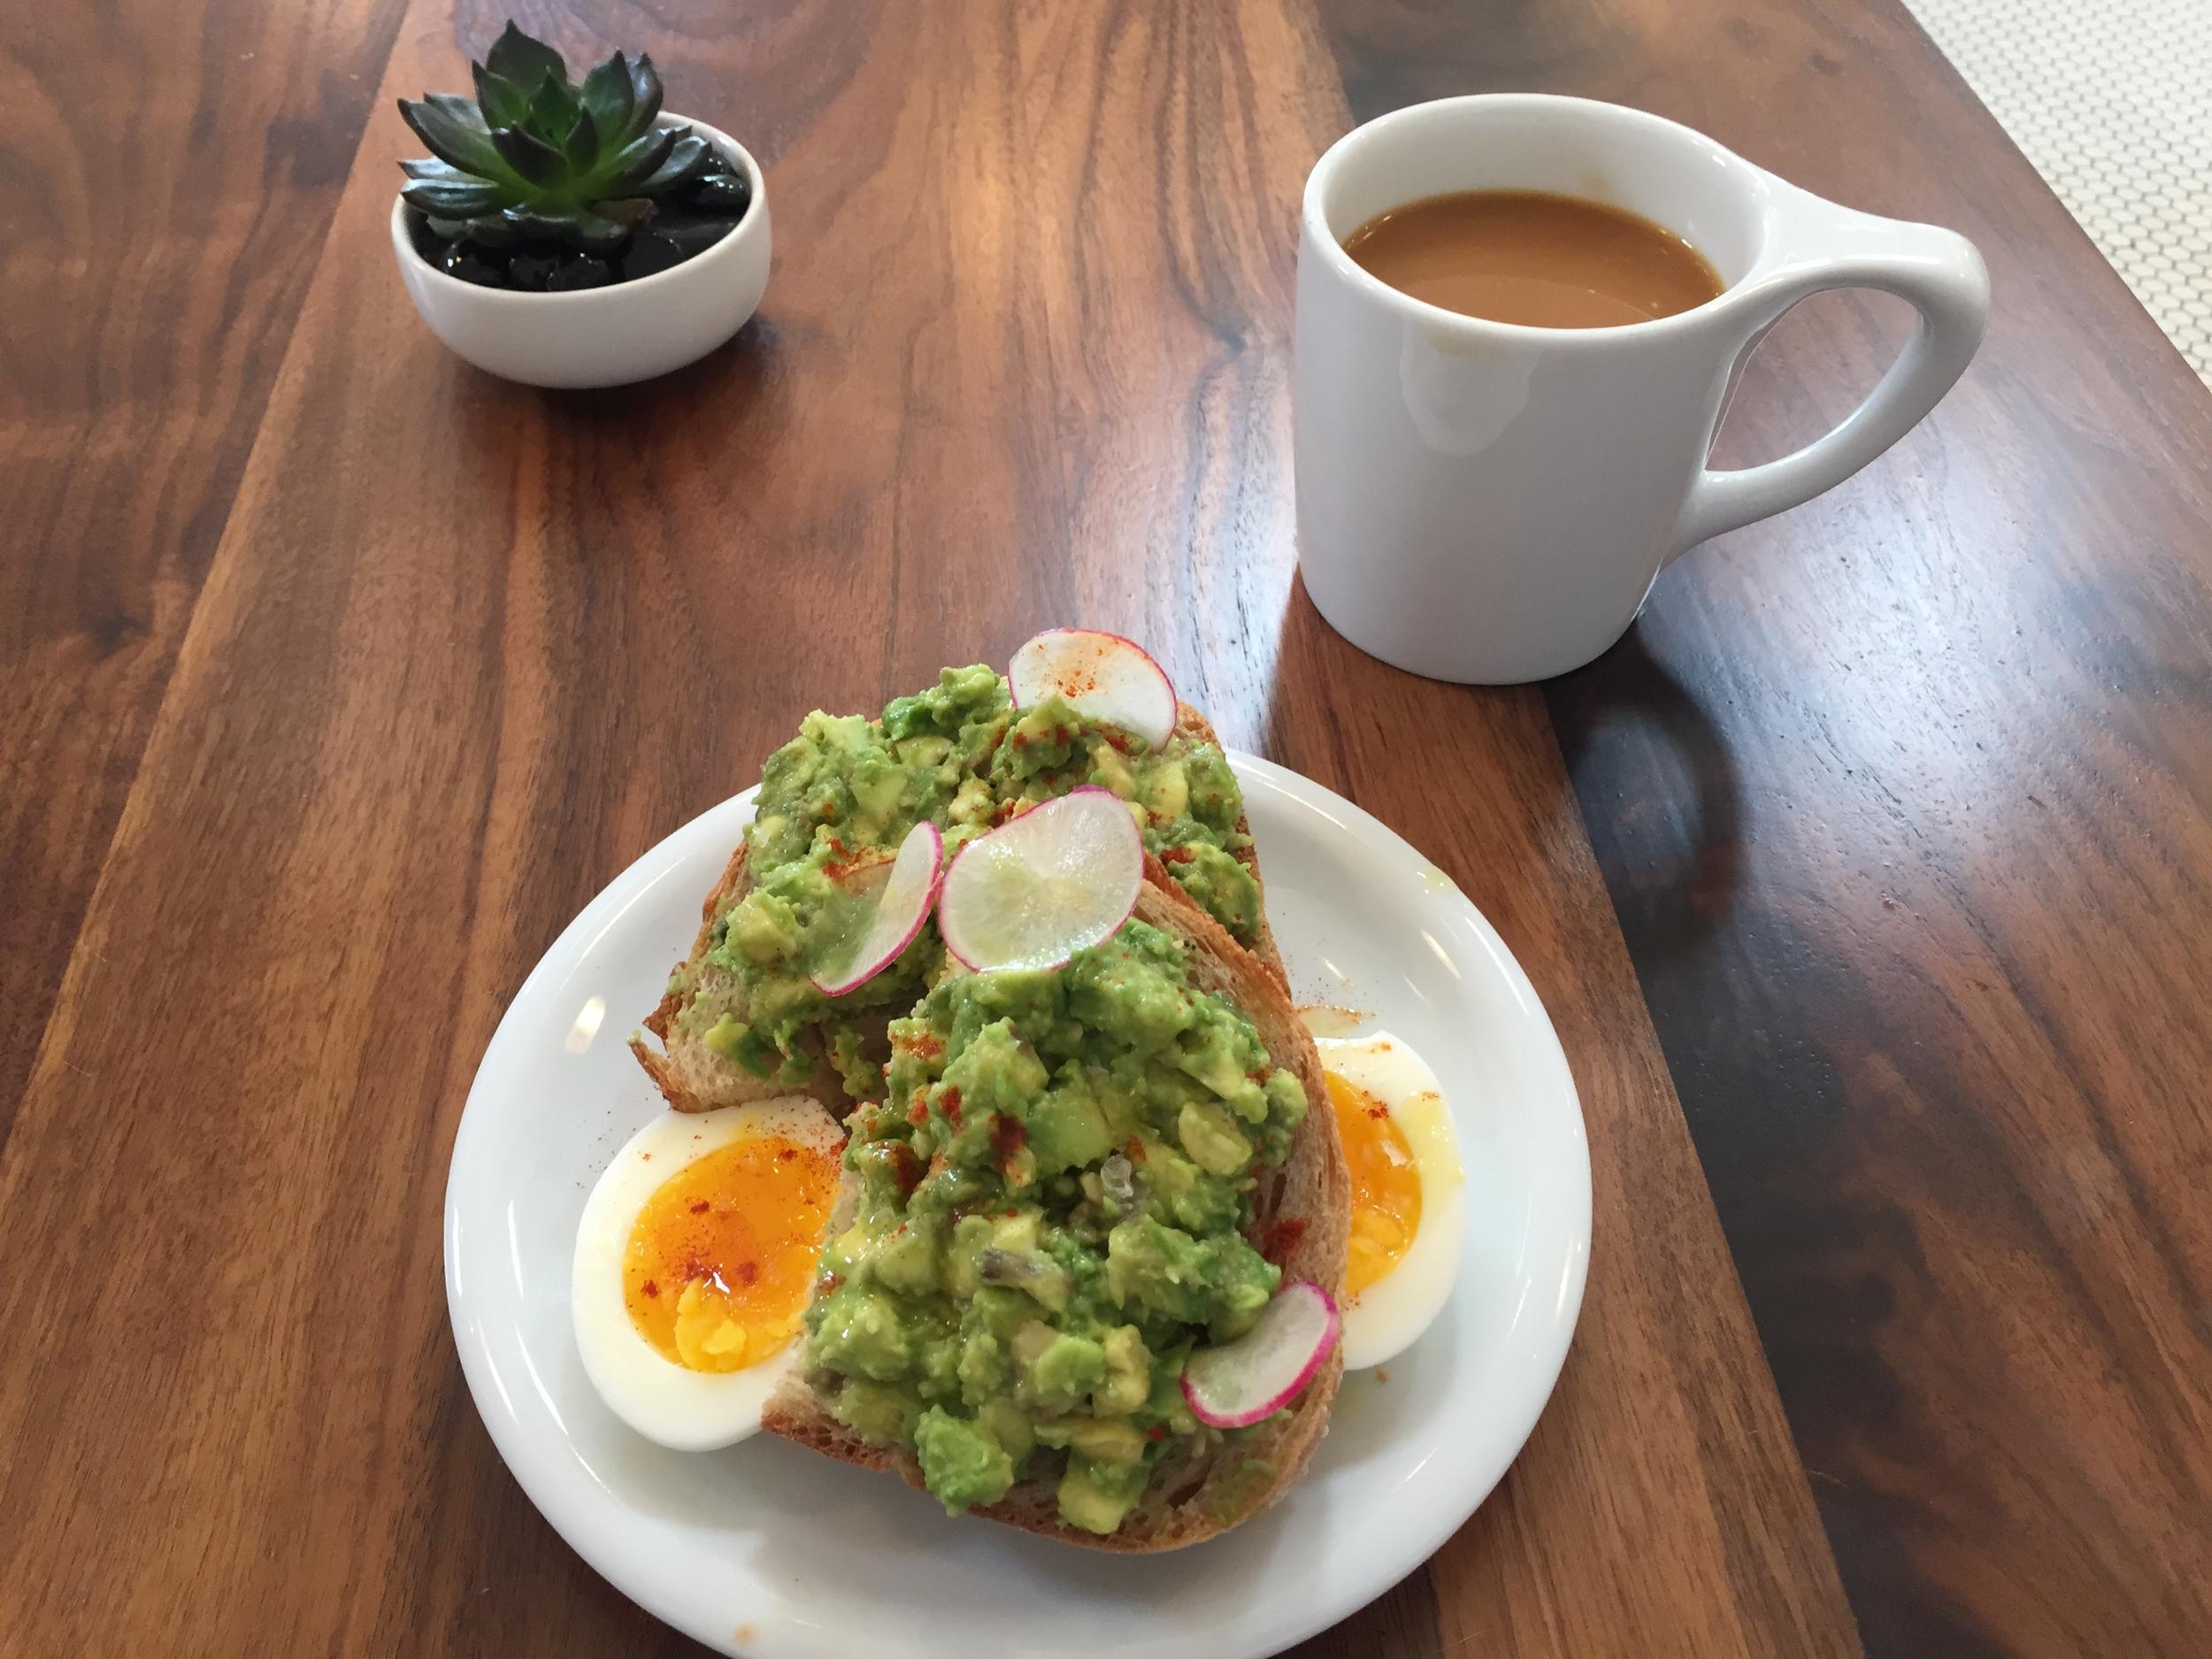 The Avocado and Egg Tartine at Alpine Modern Cafe